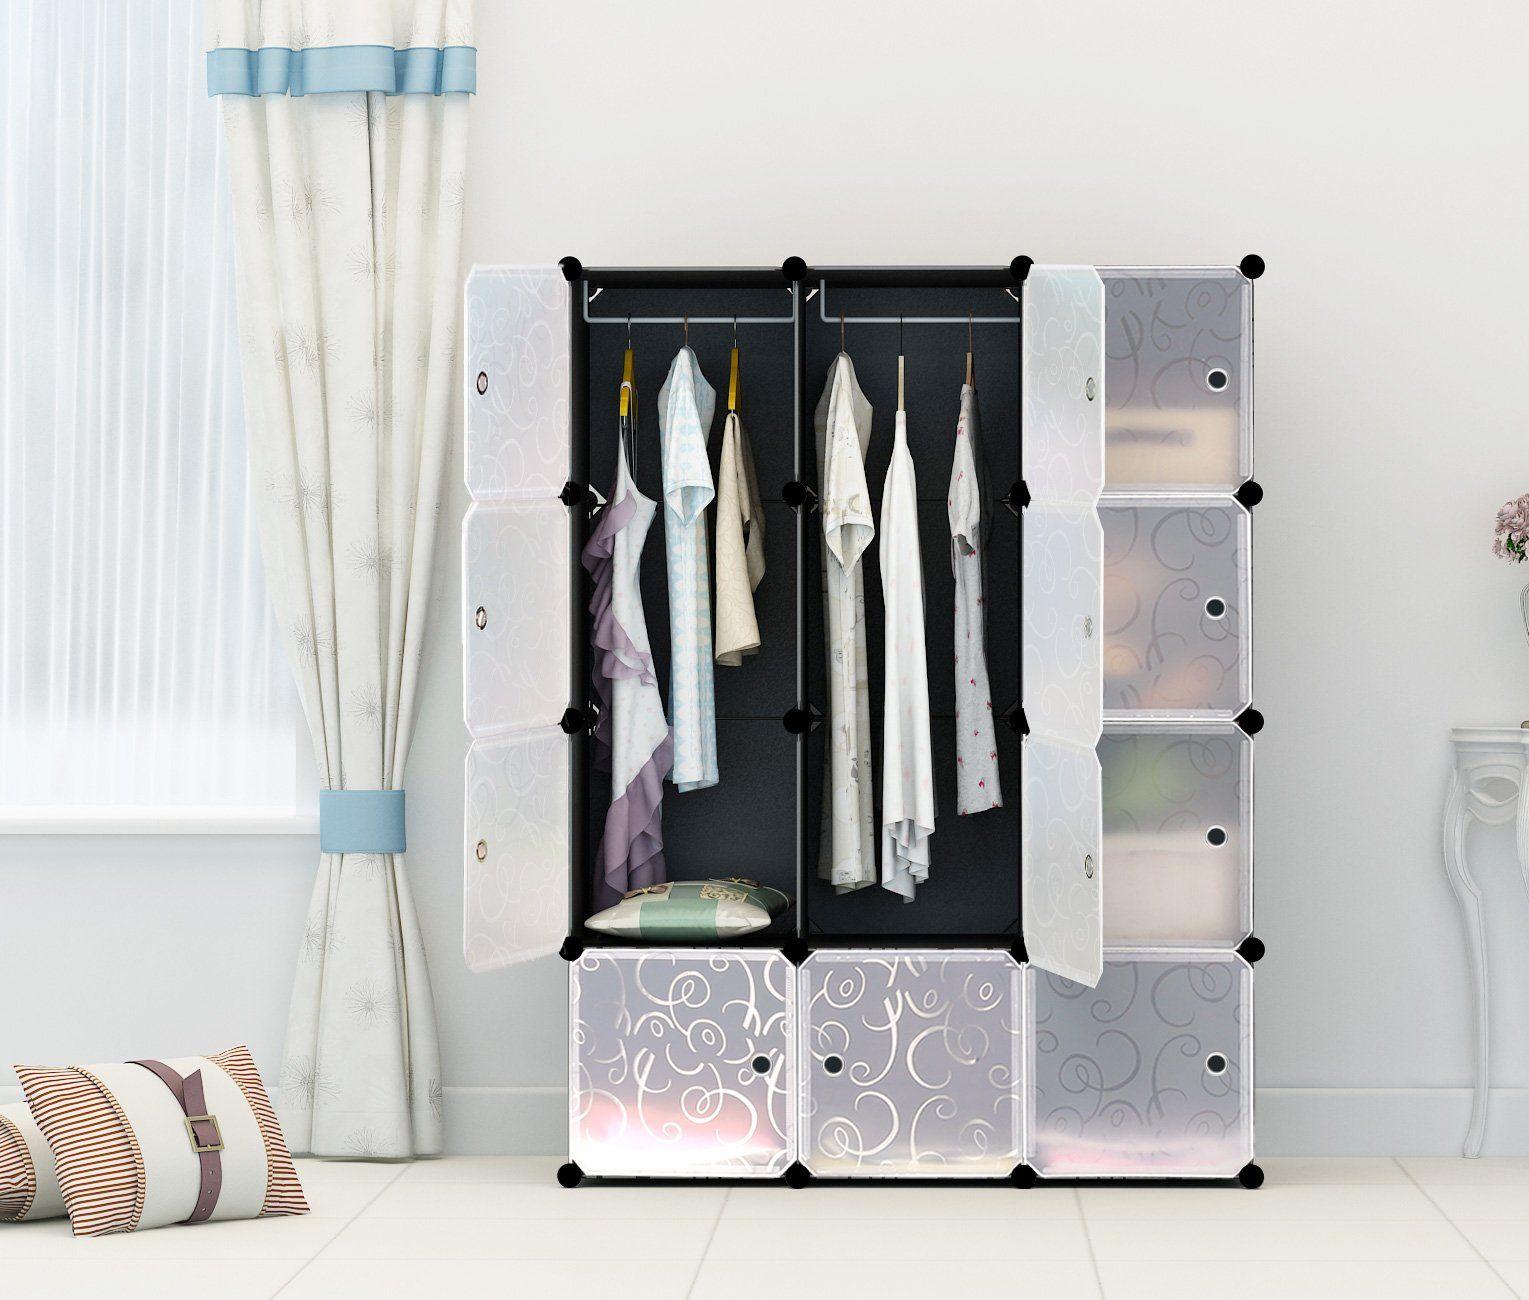 Portable Clothes Closet Wardrobe by KOUSI-Freestanding Storage Organizer with doors  large space and & Portable Clothes Closet Wardrobe by KOUSI-Freestanding Storage ... Pezcame.Com